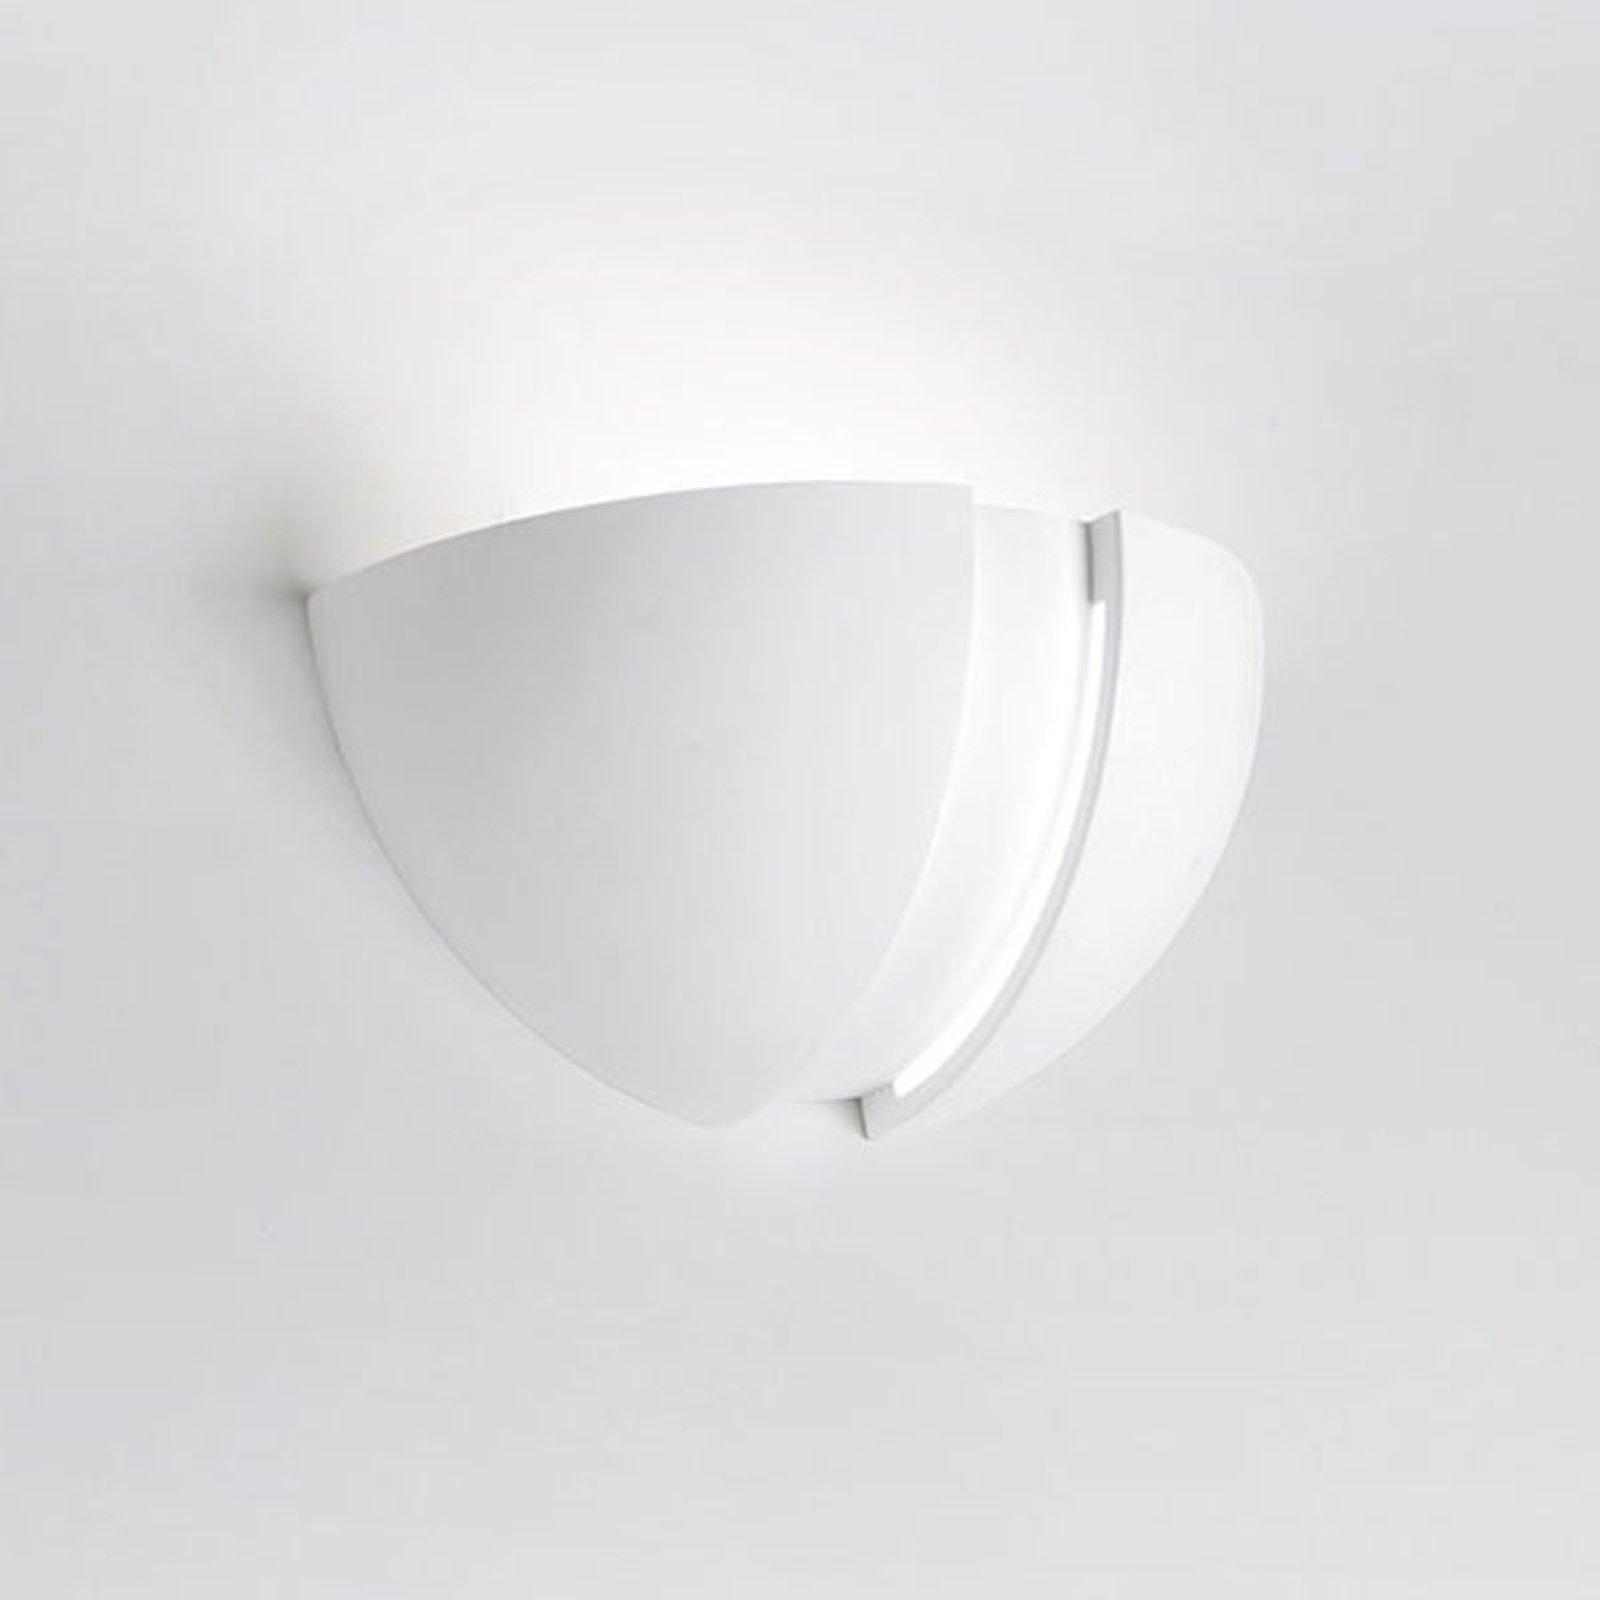 Vegglampe Carystus E27